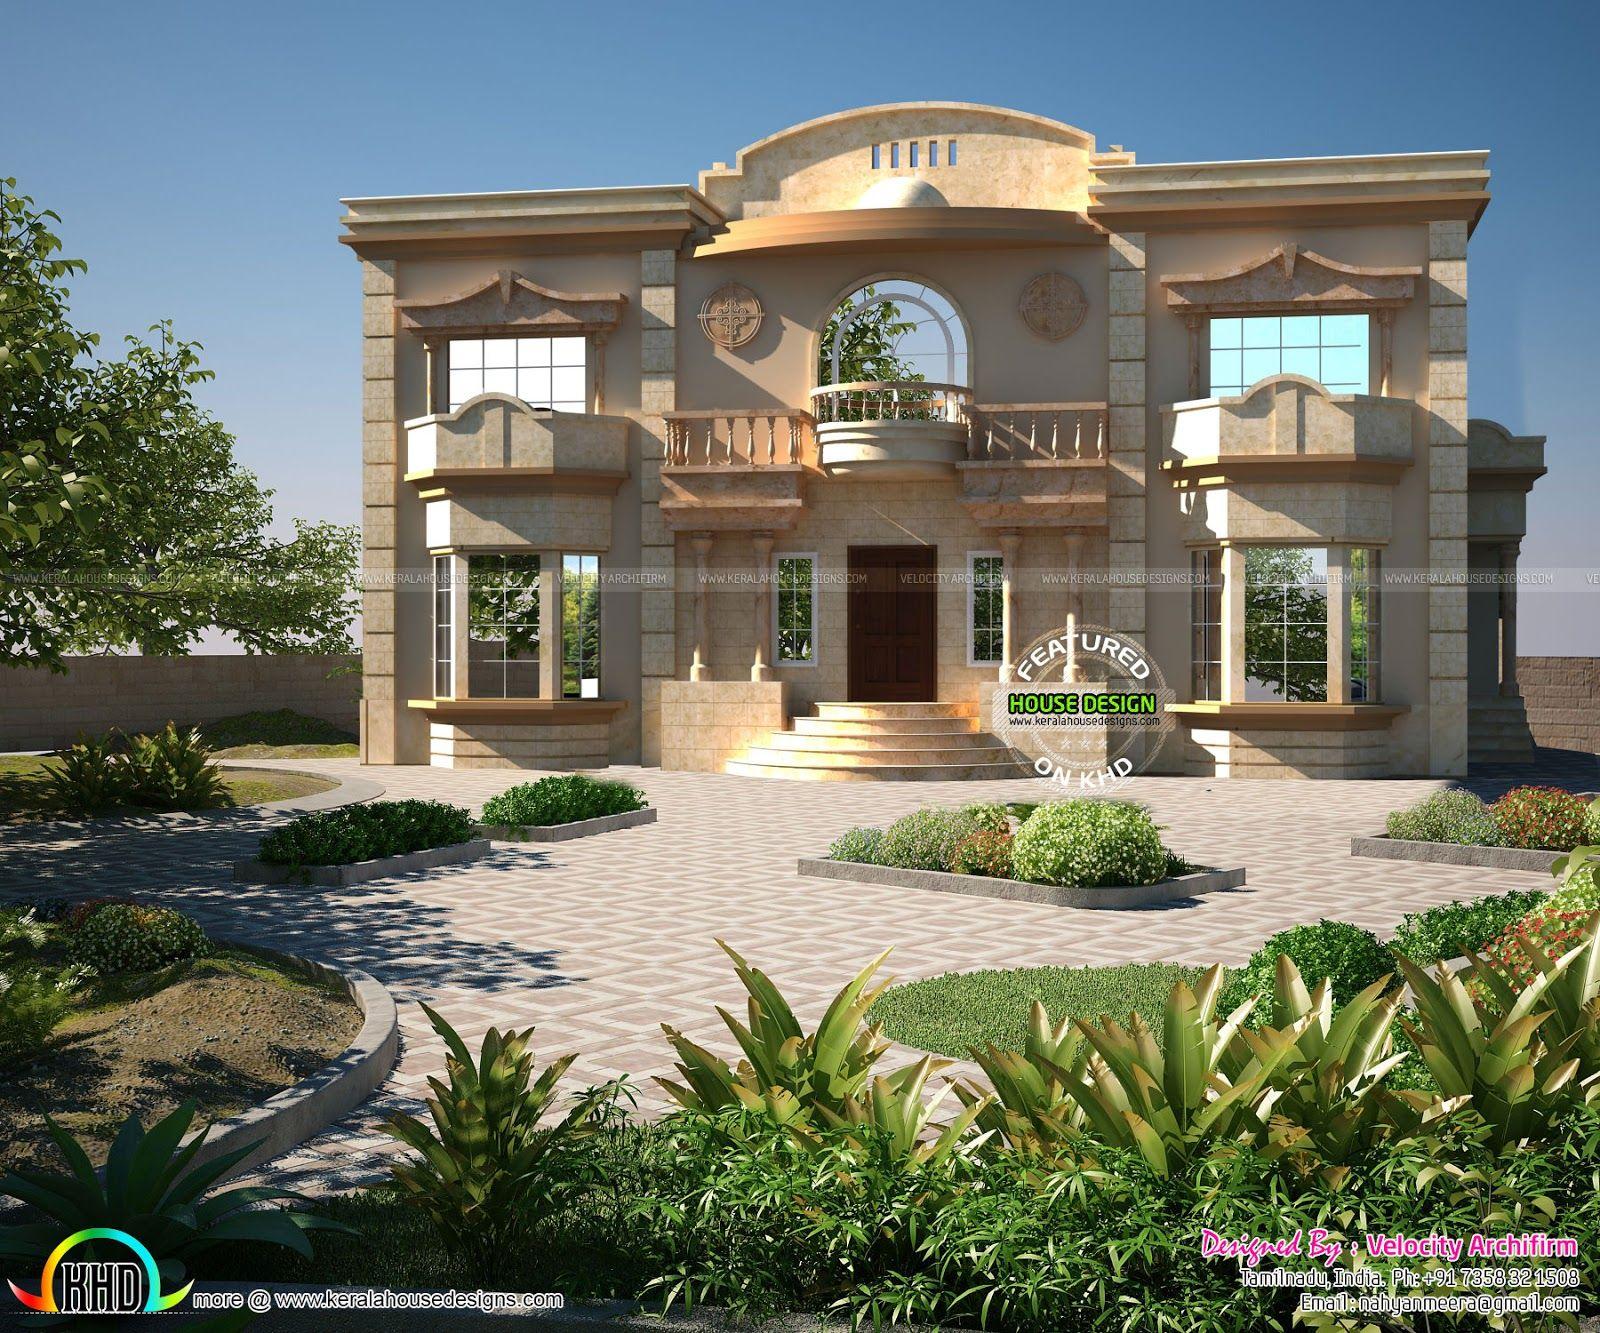 House design villa - Arabian Villa Rendering Google Search Islamic Villa Pinterest Villas And House